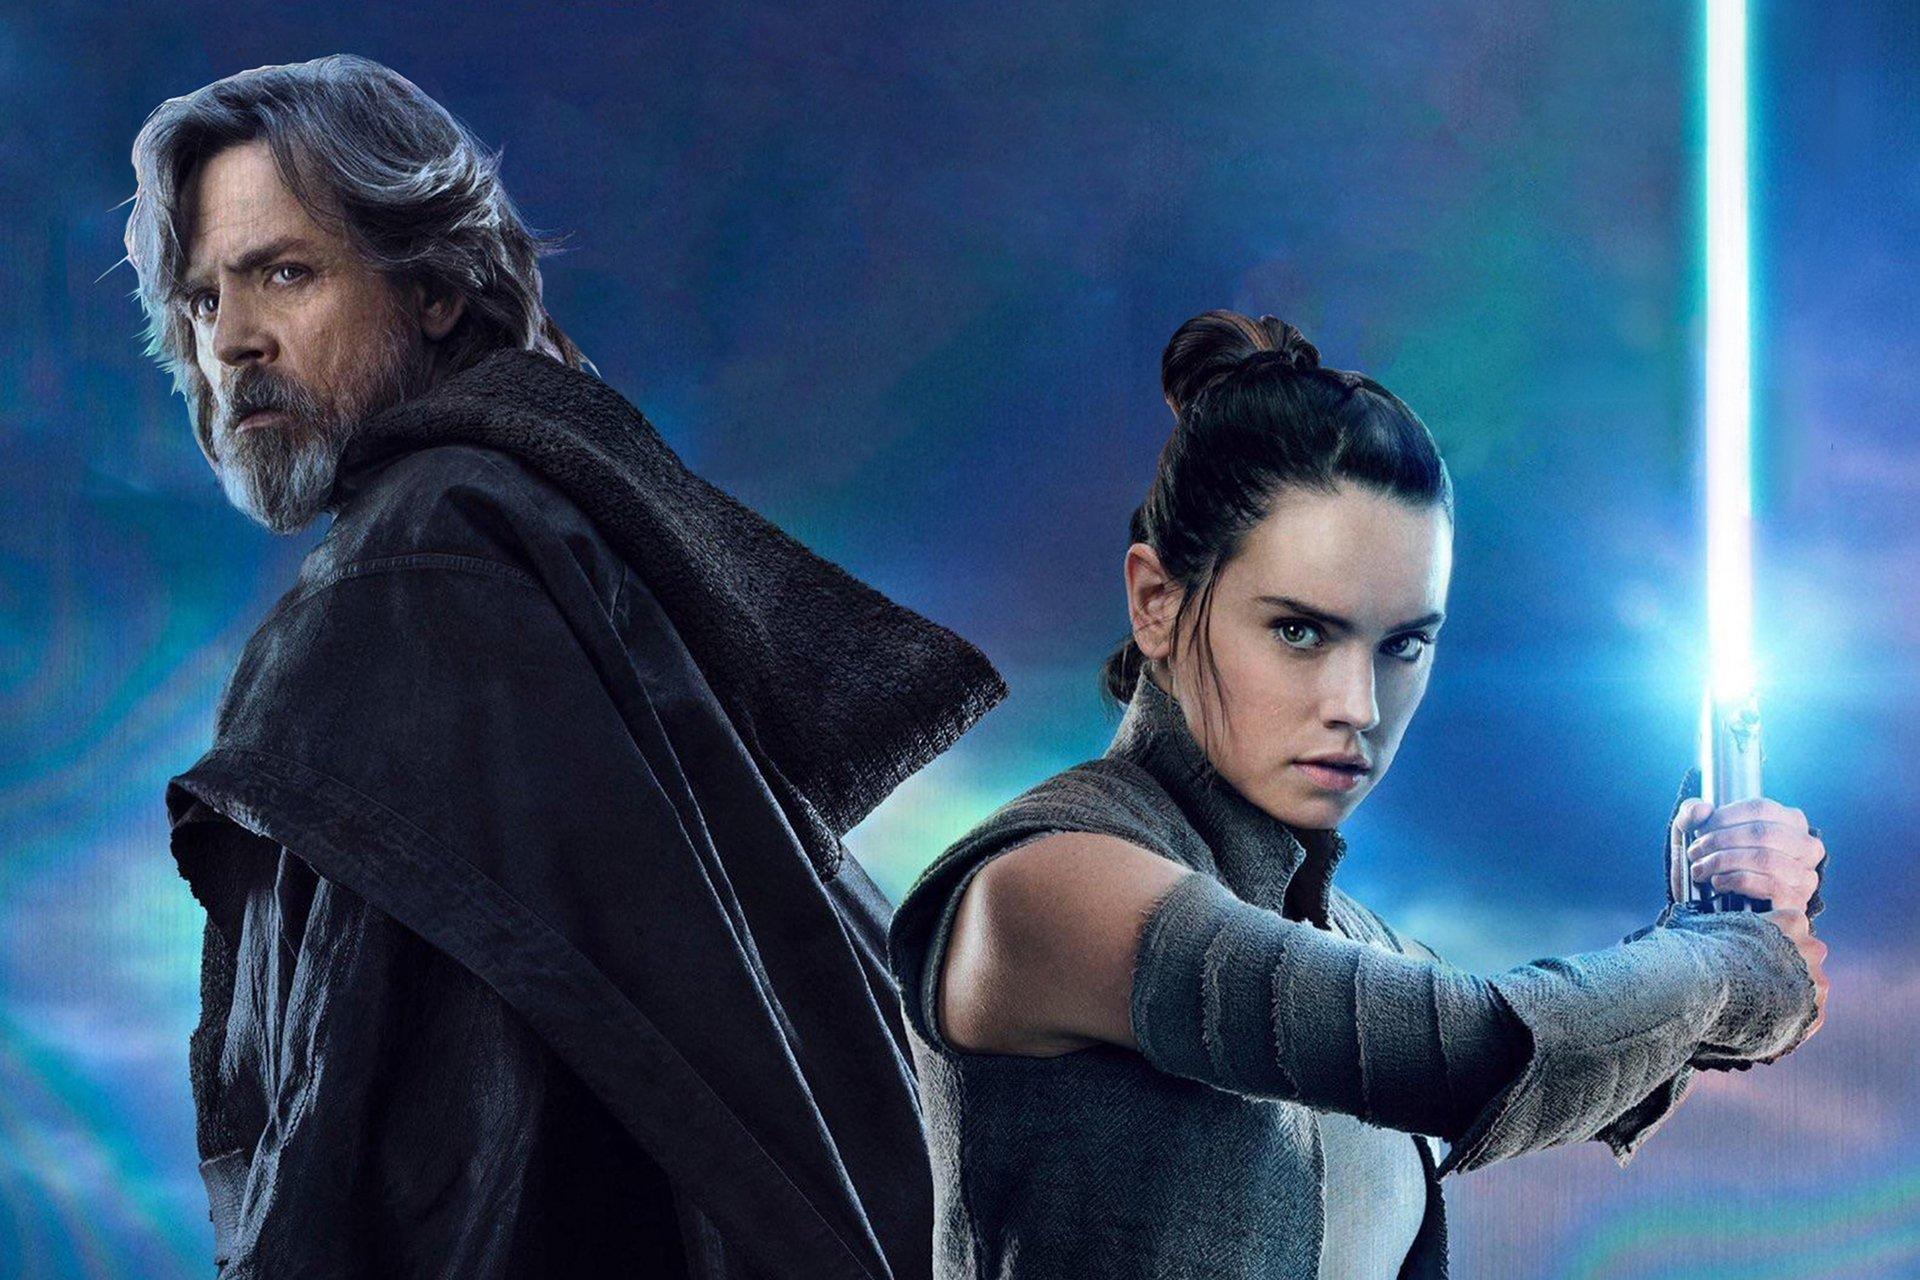 Luke Skywalker And Rey Hd Wallpaper Background Image 1920x1280